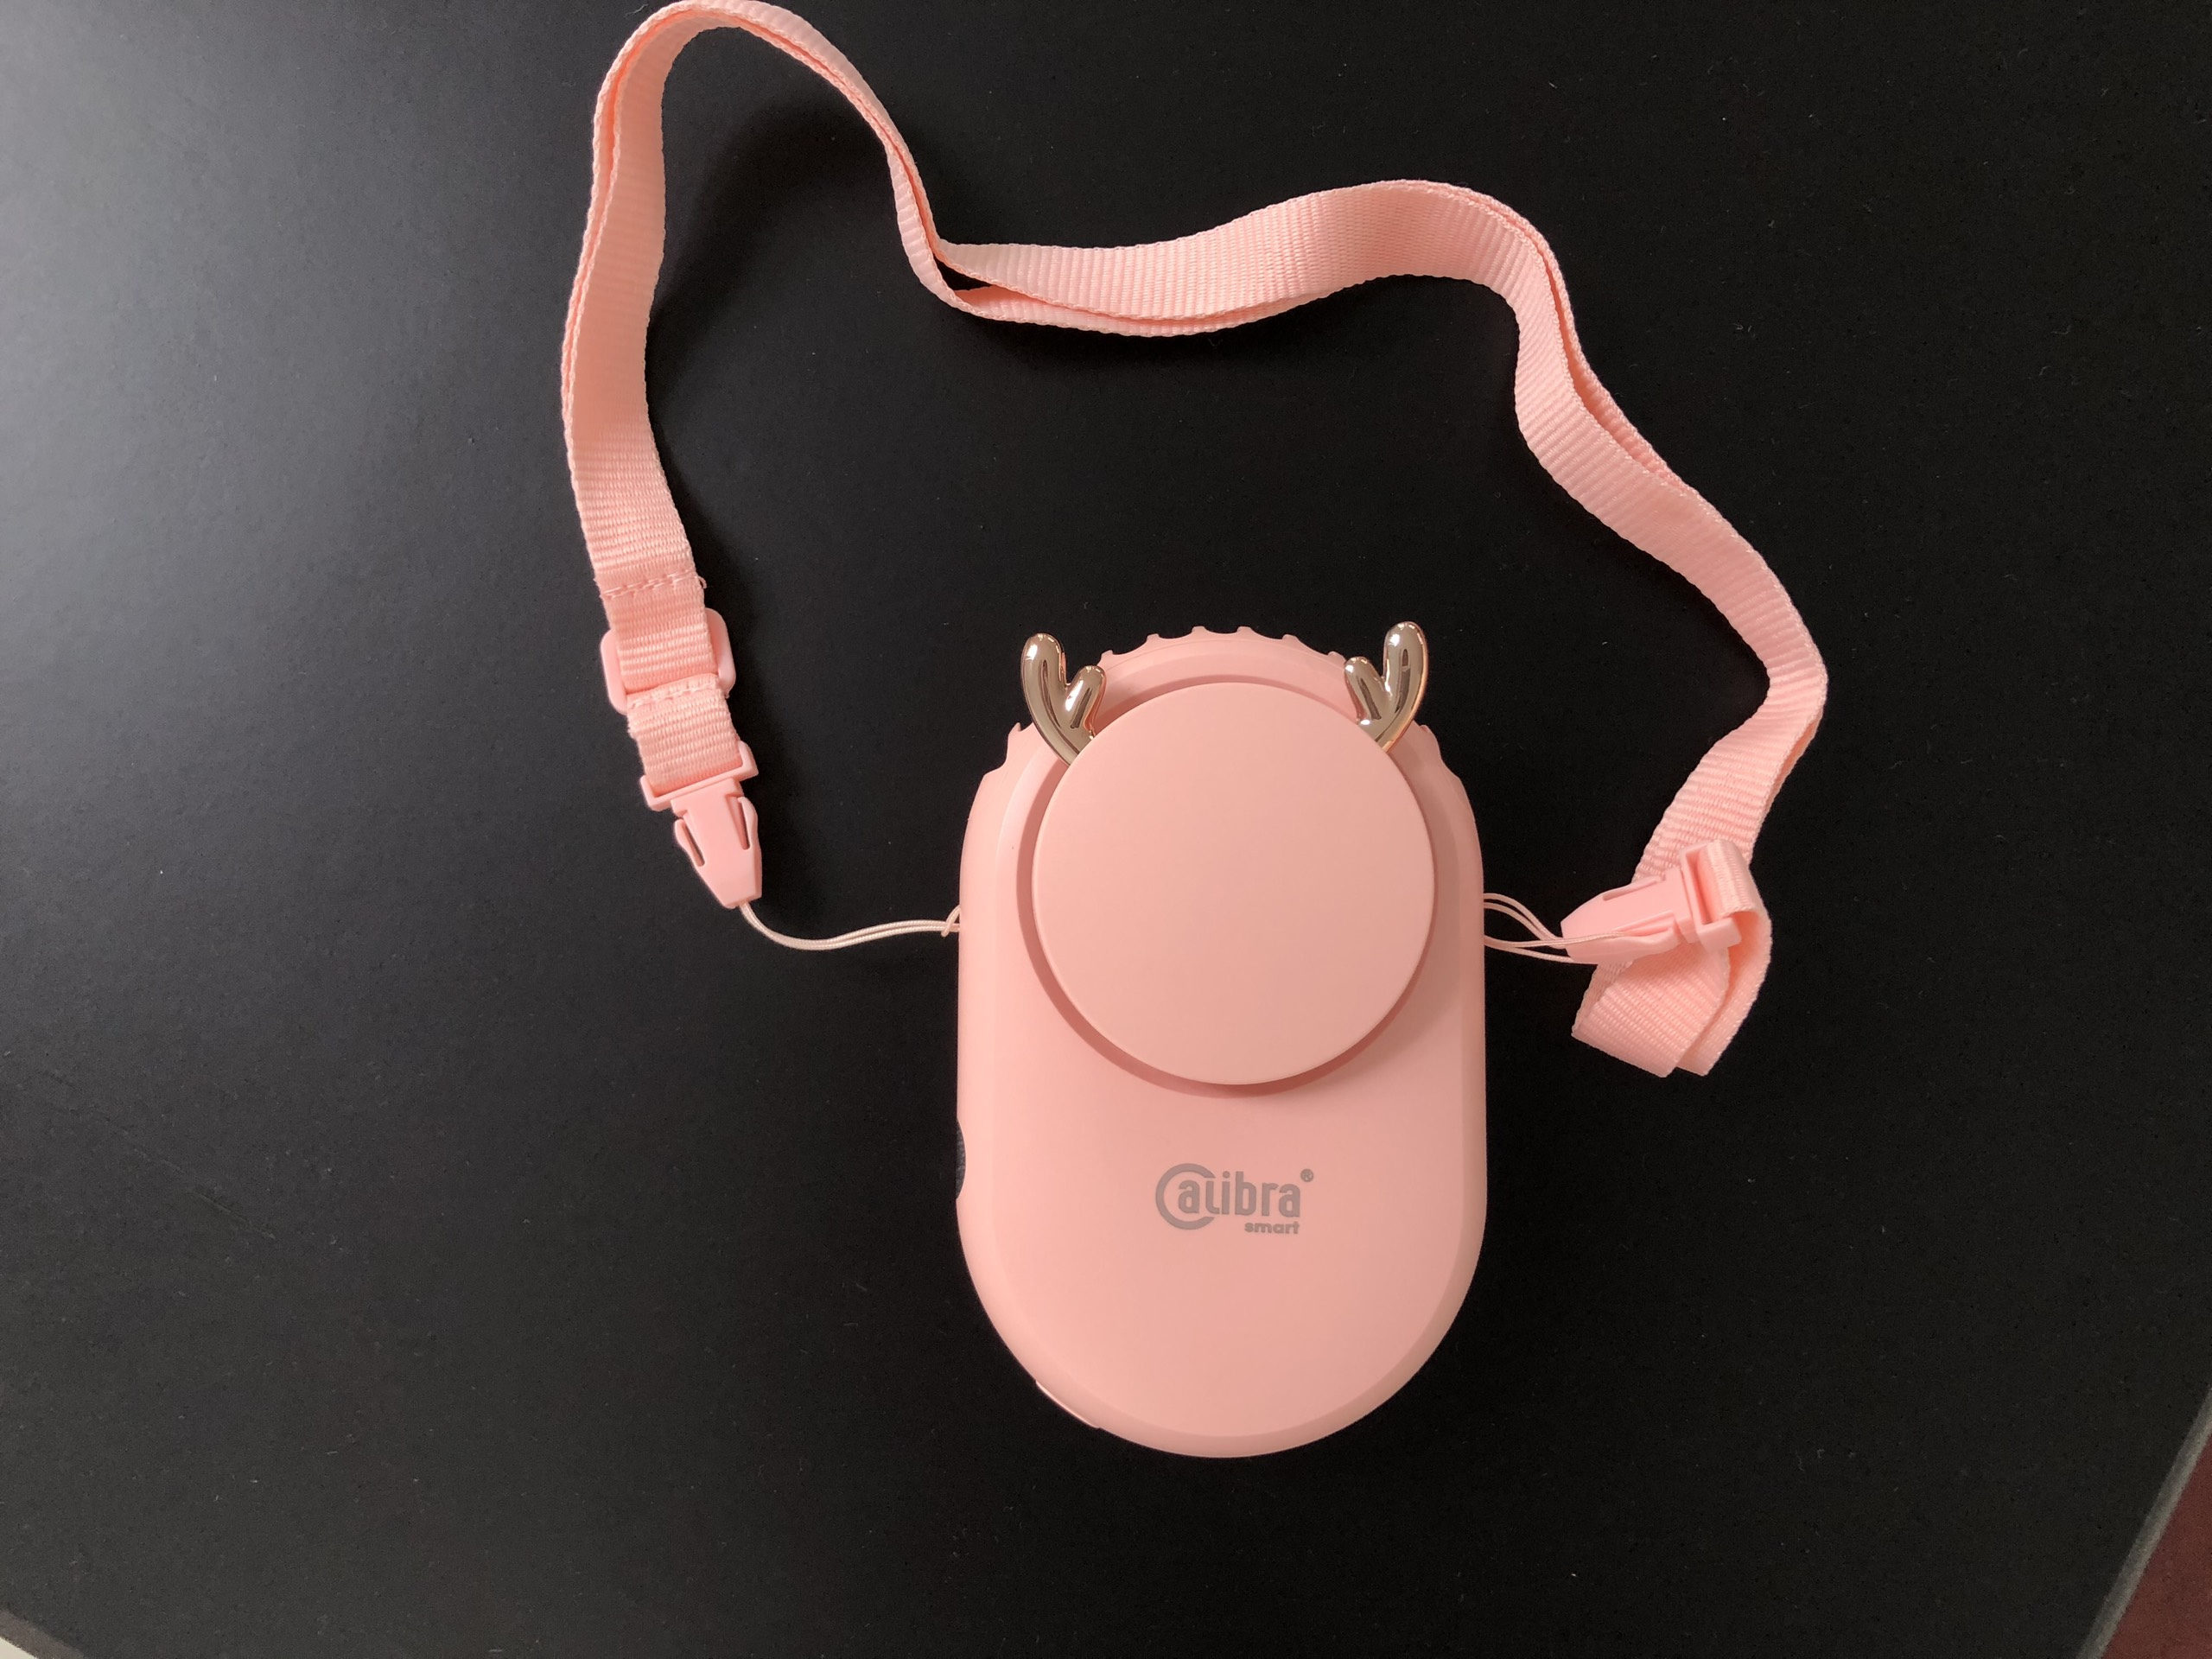 Quạt mini chính hãng Calibra CQ-E888- Quạt đeo cổ